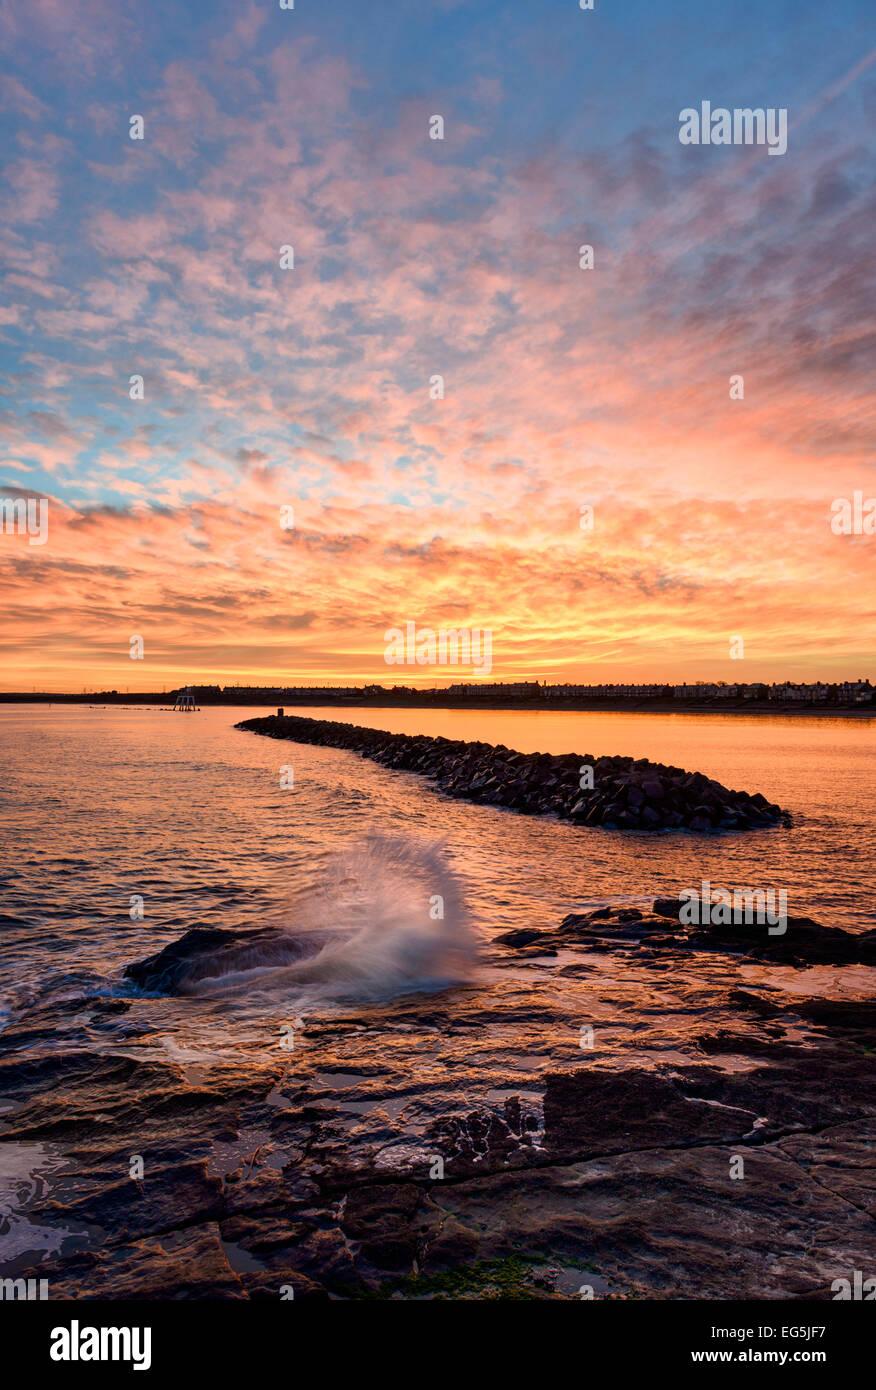 Coucher de soleil au bord de la mer Newbiggin Photo Stock